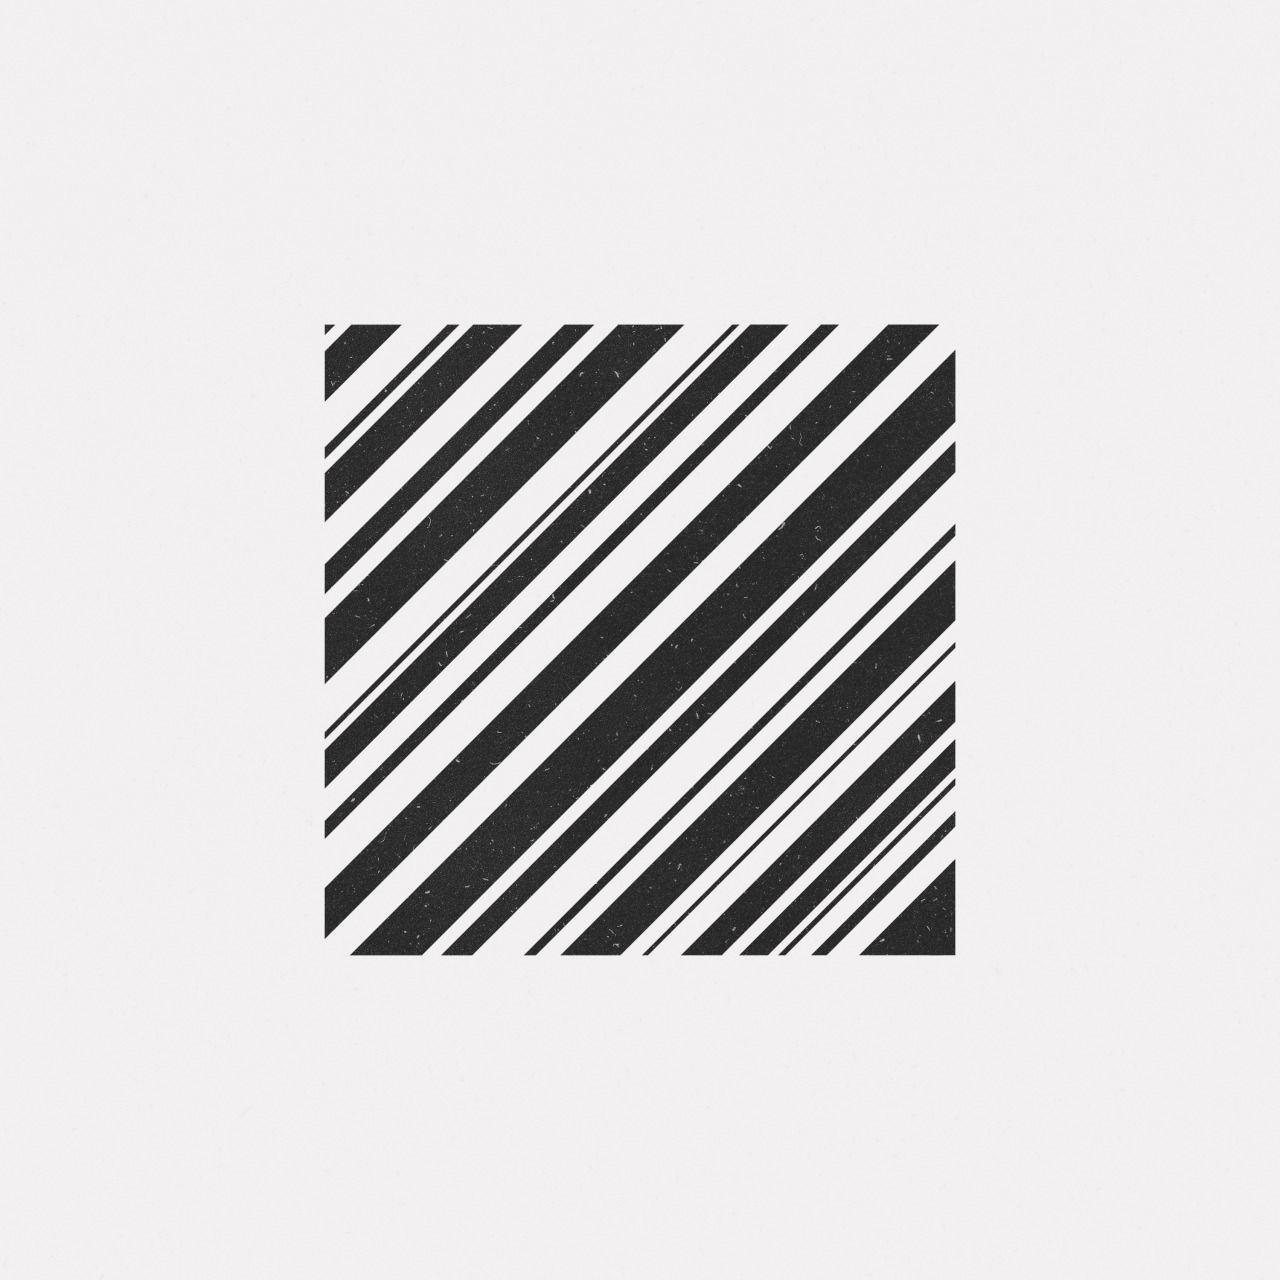 #MI16-585 A new geometric design every day